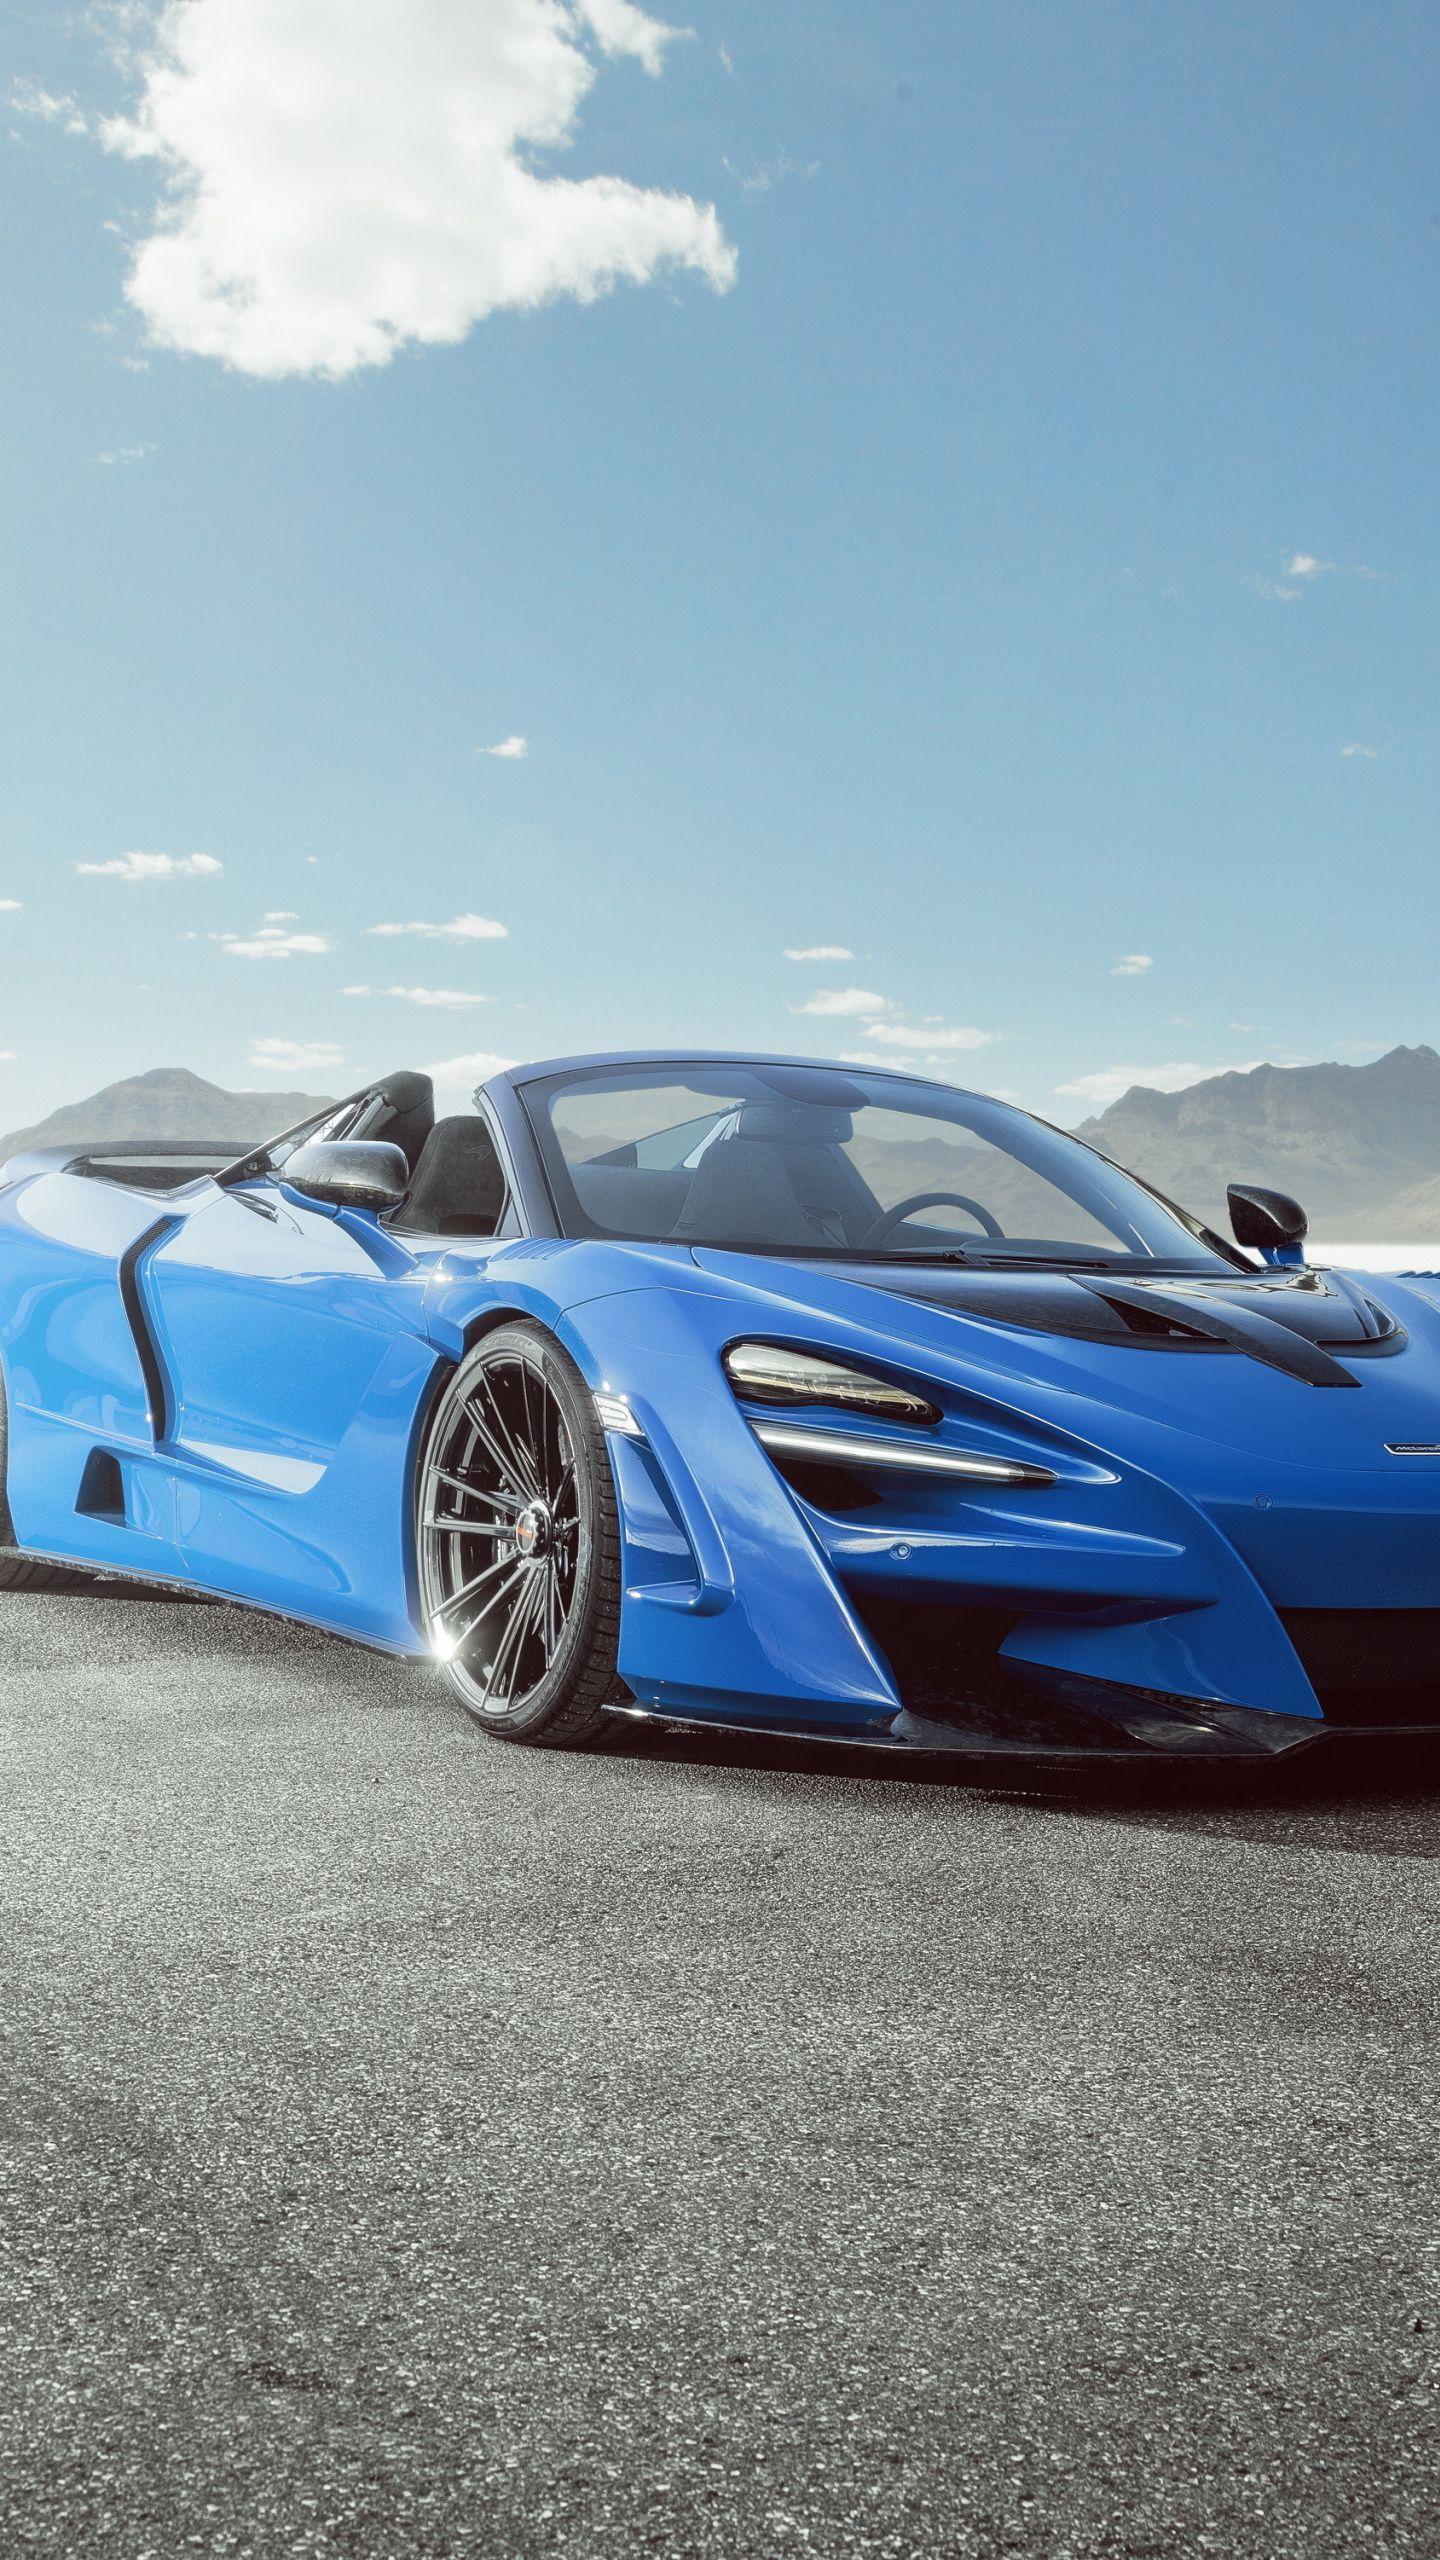 1440x2560 Blue Car 2020 Mclaren 720s N Largo Wallpaper Blue Car Car Super Luxury Cars